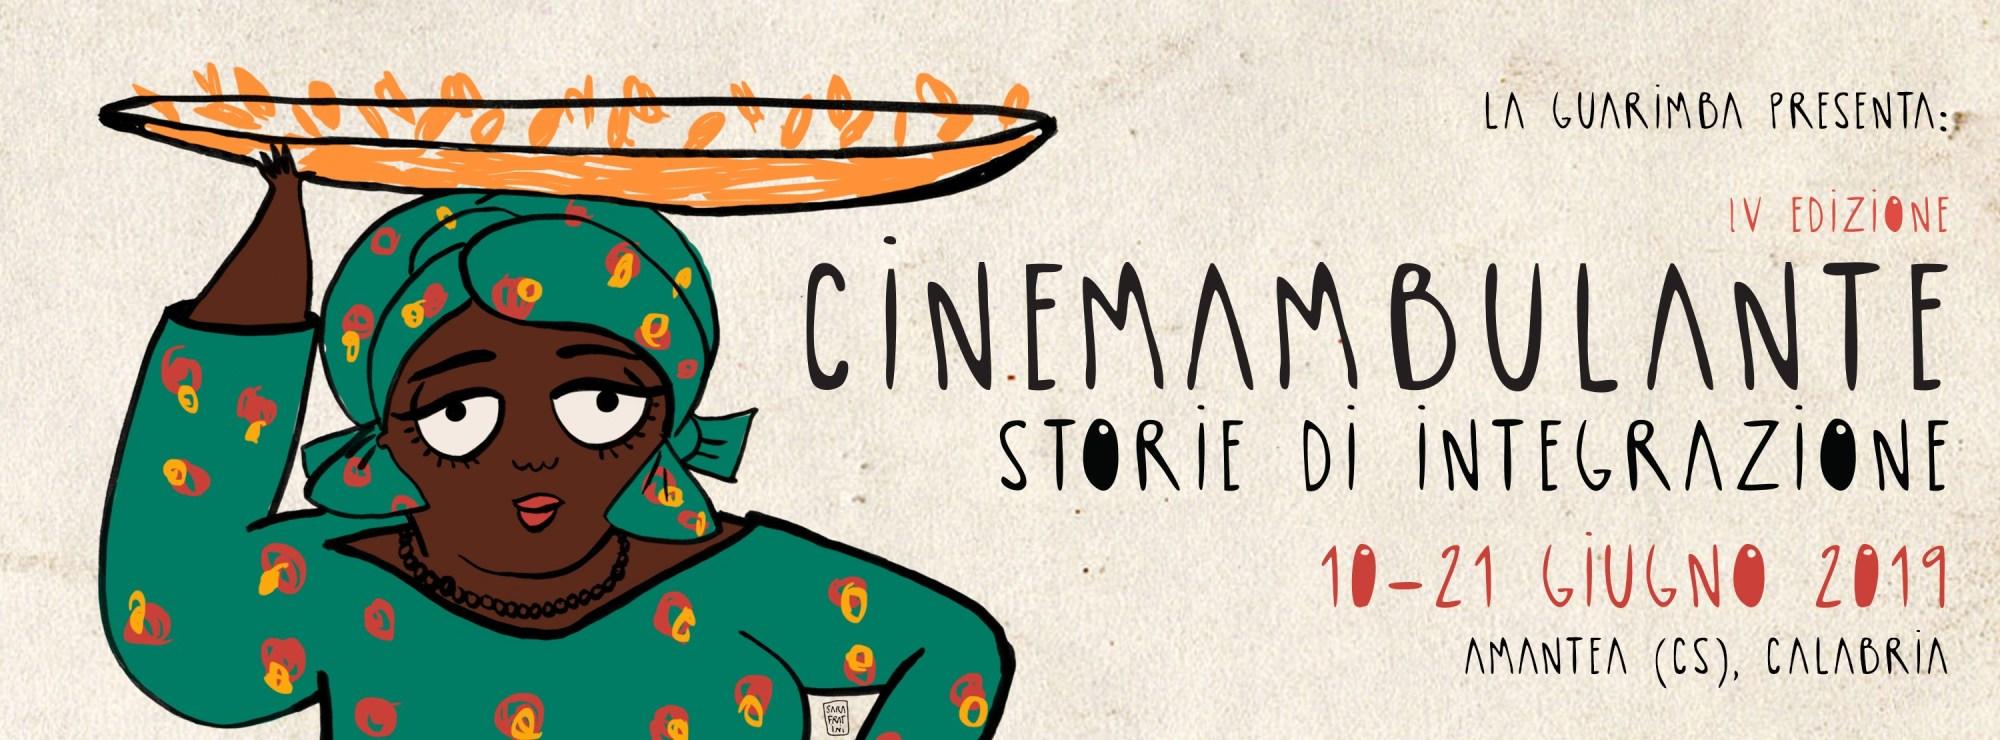 Cinemambulante iv